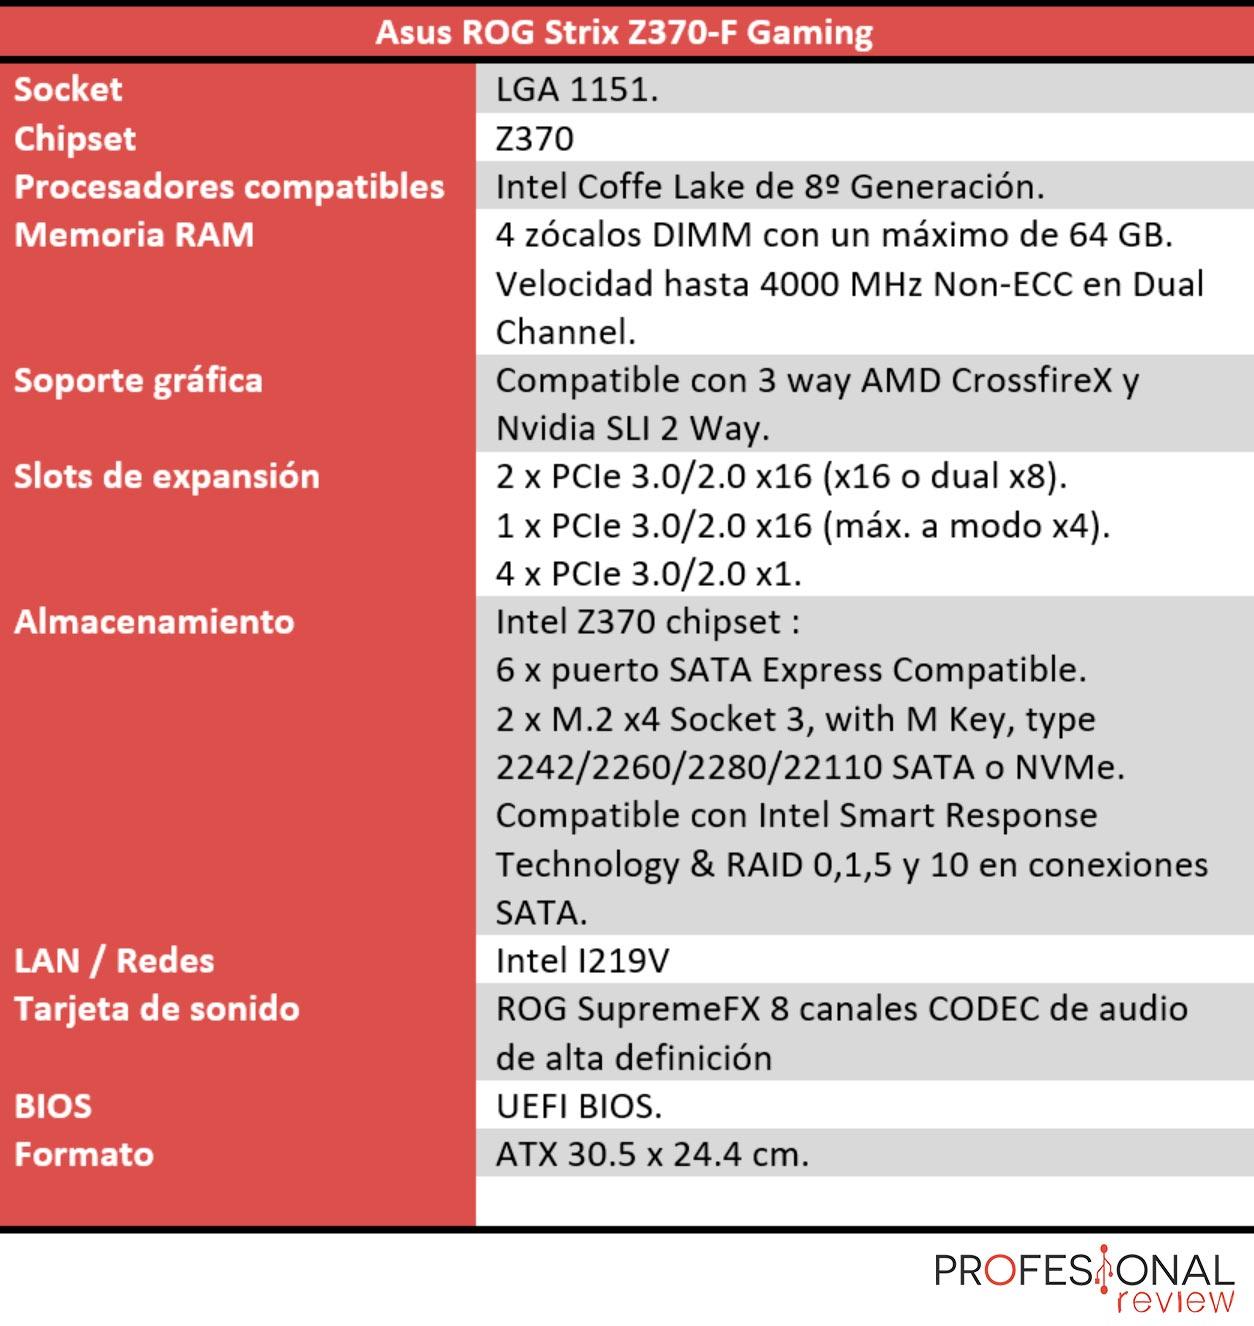 Asus ROG Strix Z370-F Gaming caracteristicas